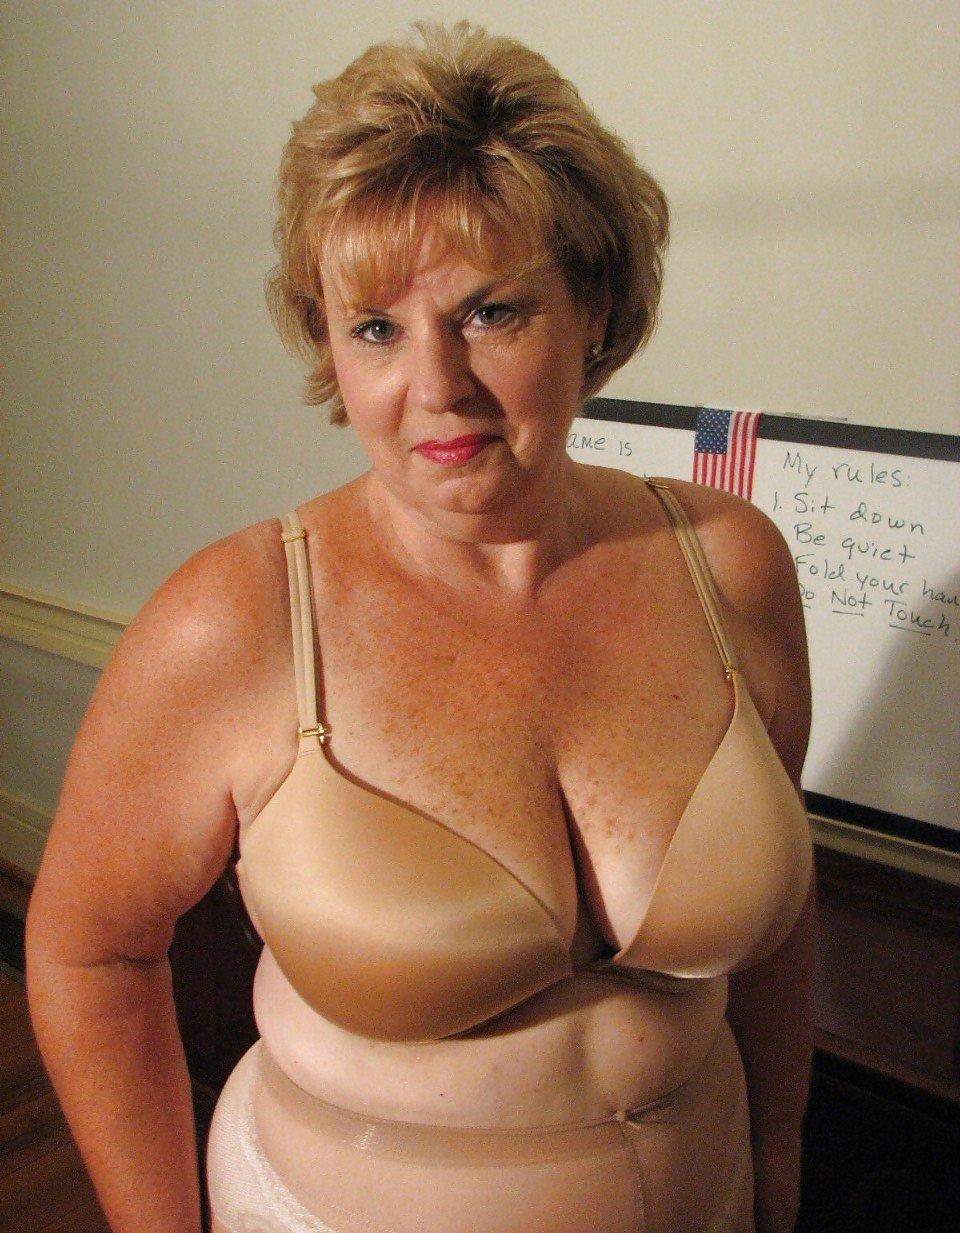 Girl Big Boobs Sex On Nude Beach